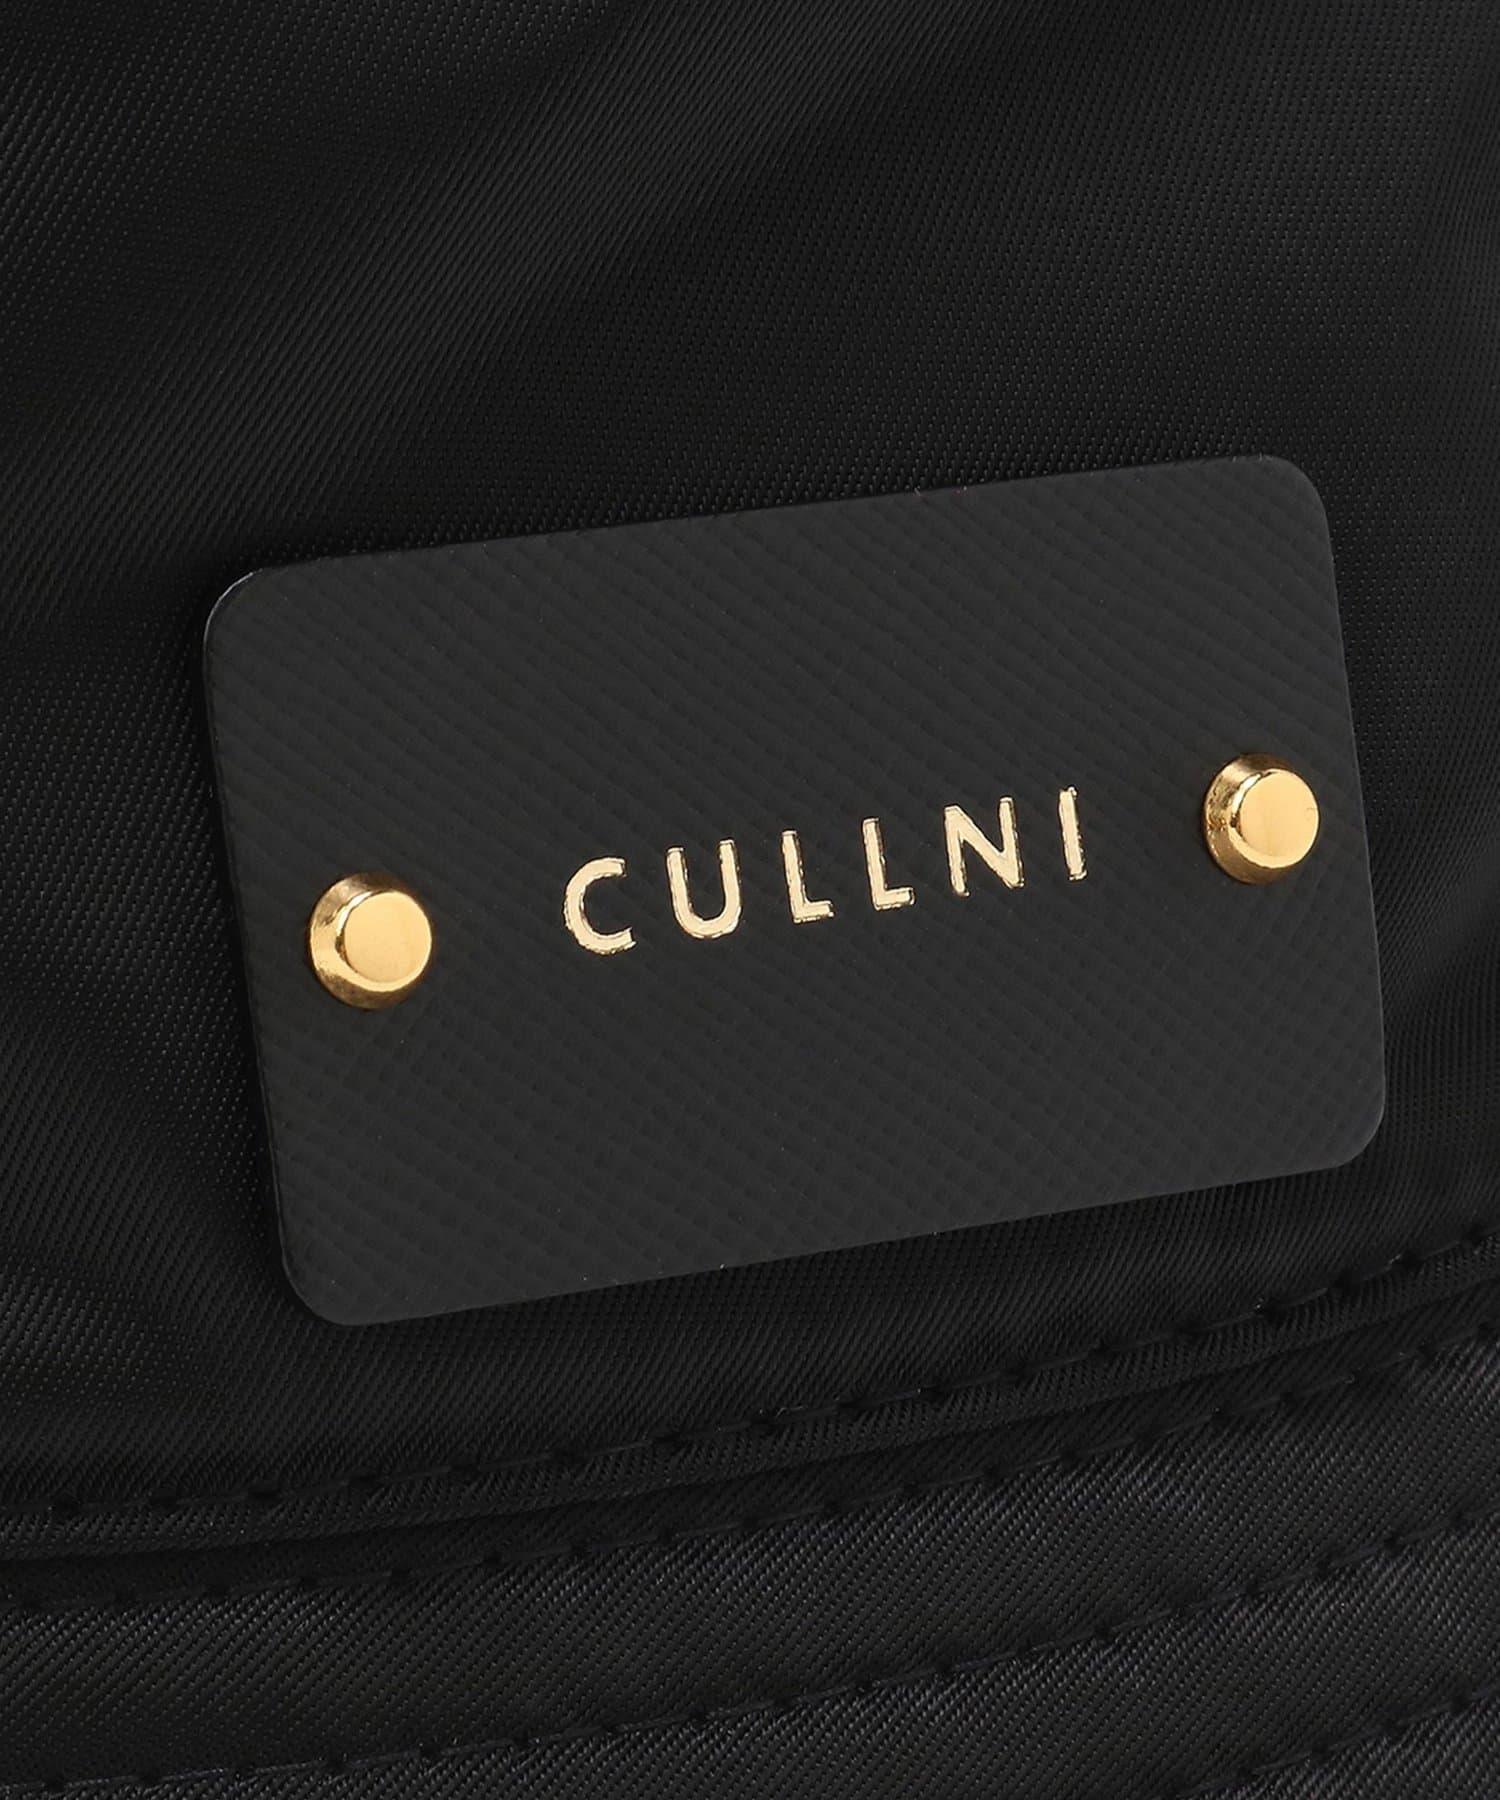 Lui's(ルイス) 【CULLNI/クルニ】バケットハット